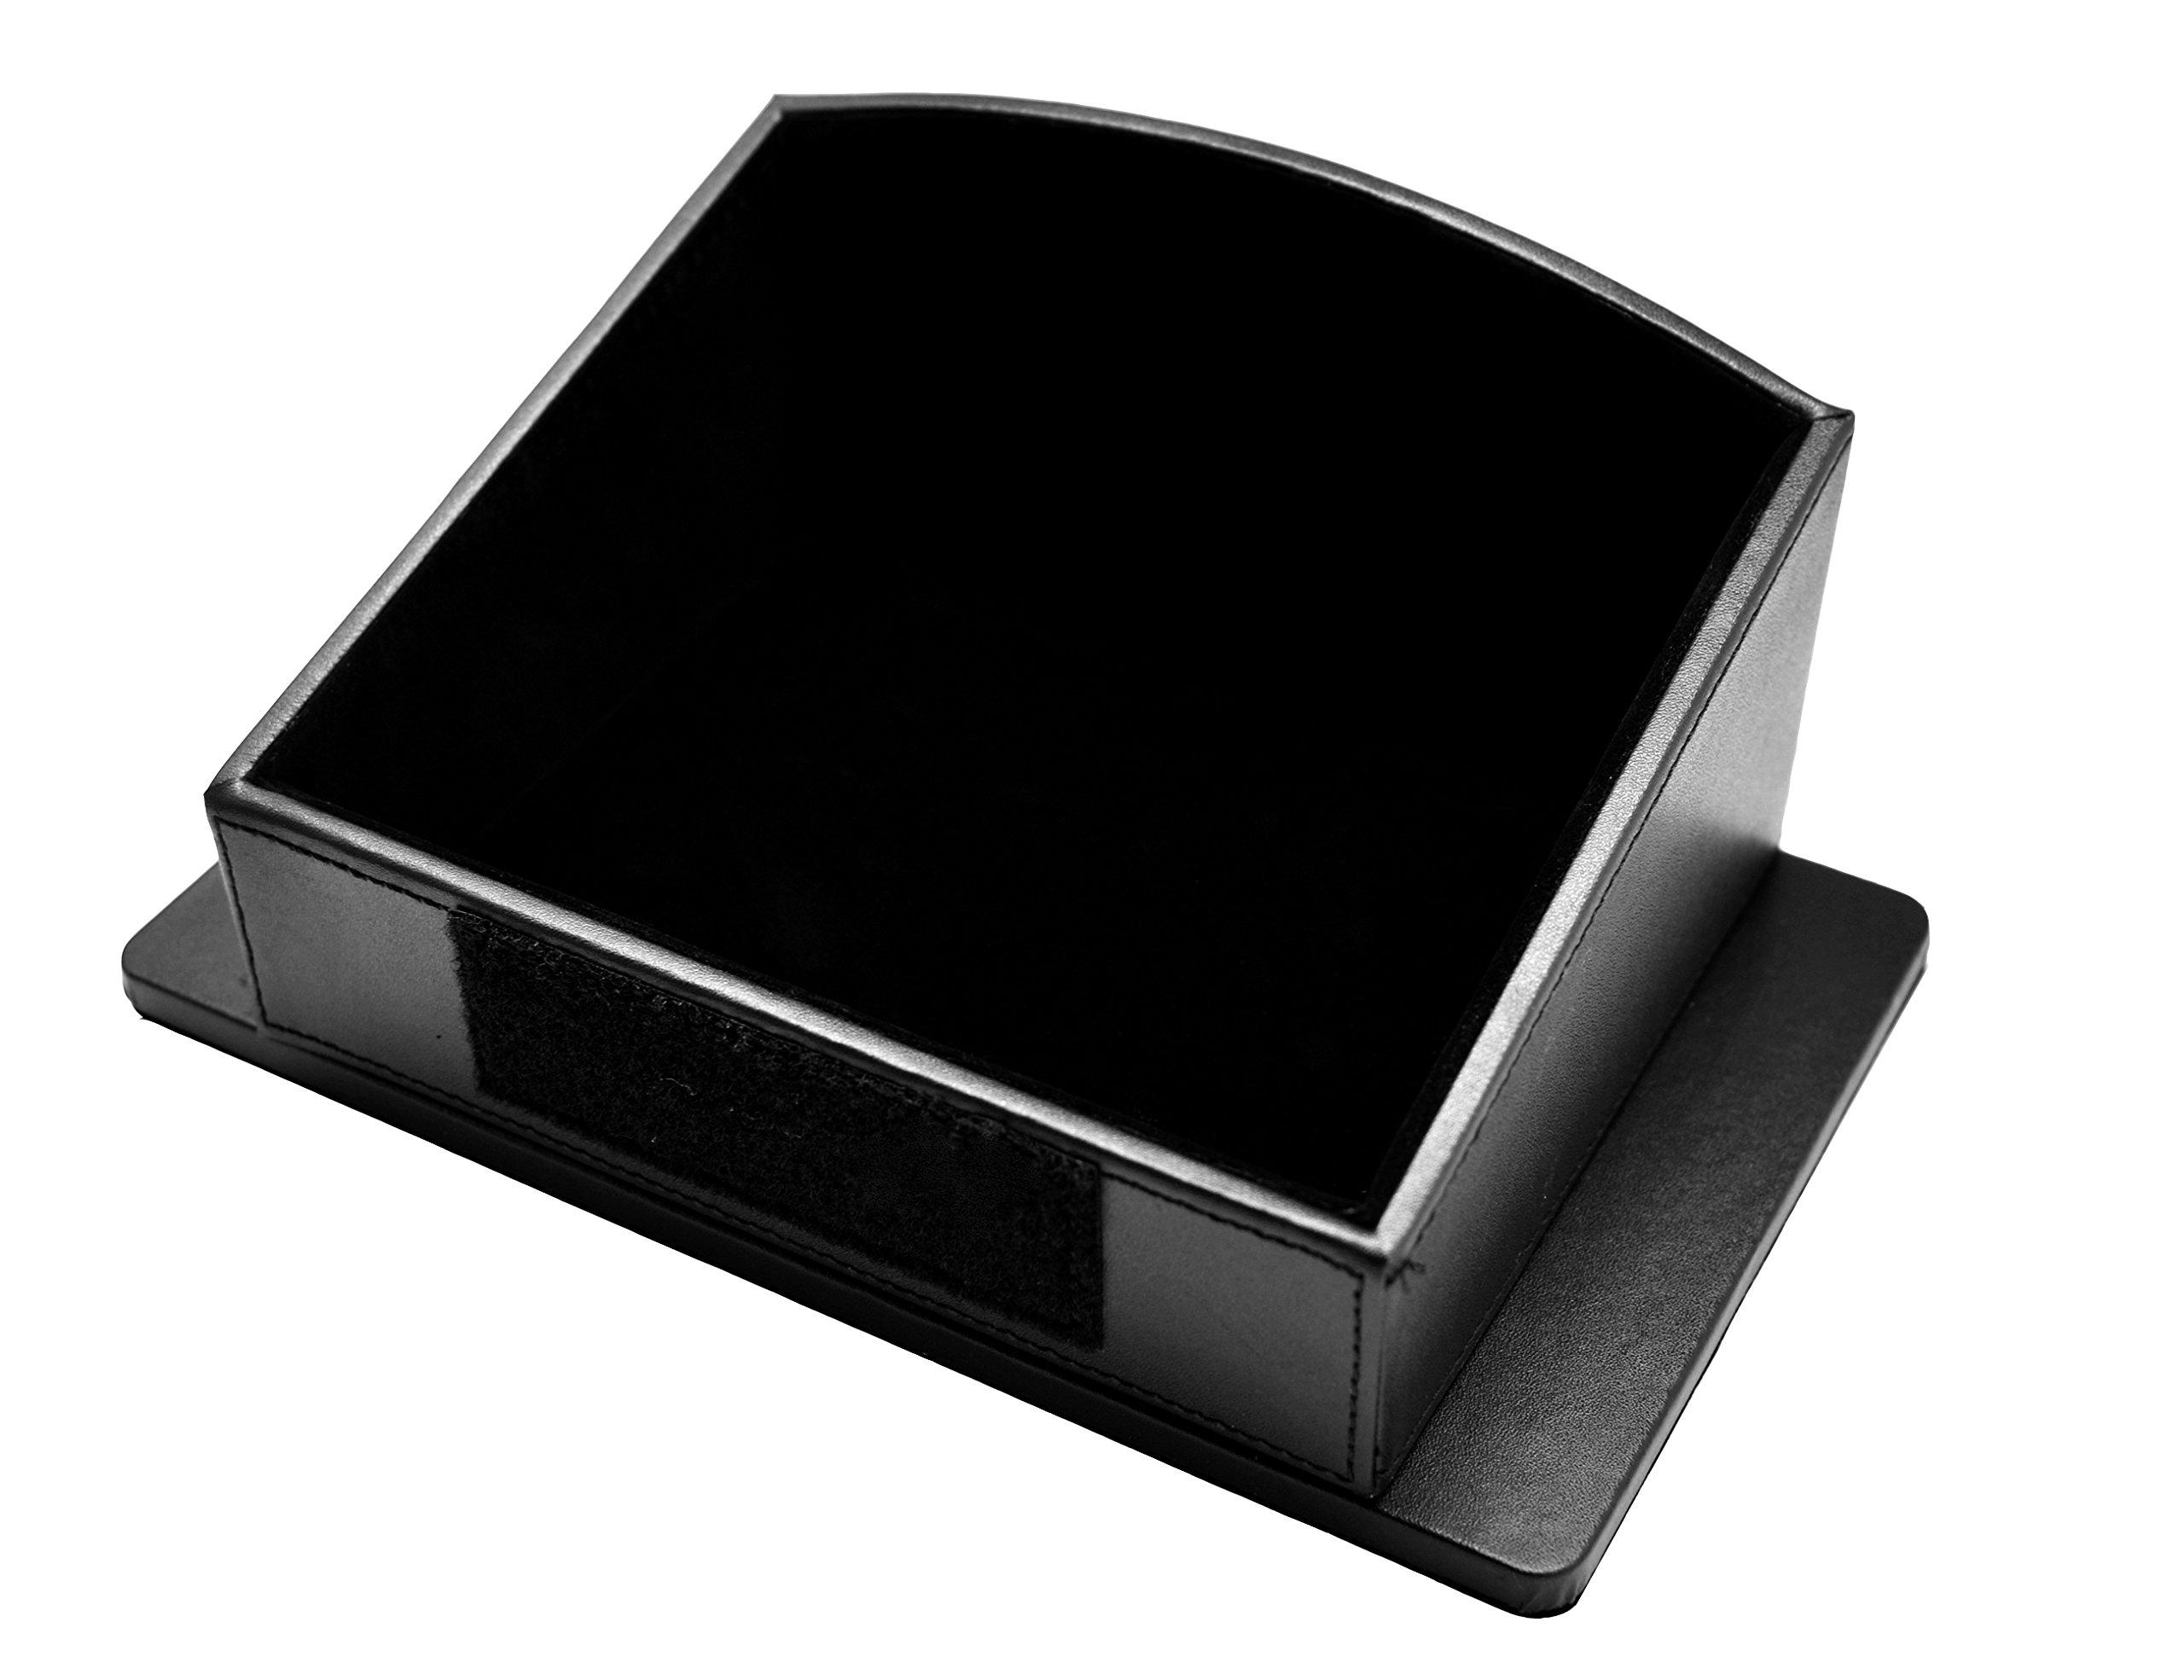 Topfit Rear Center Storage Box for Tesla Model S, Seat Back Center Container for Tesla Black